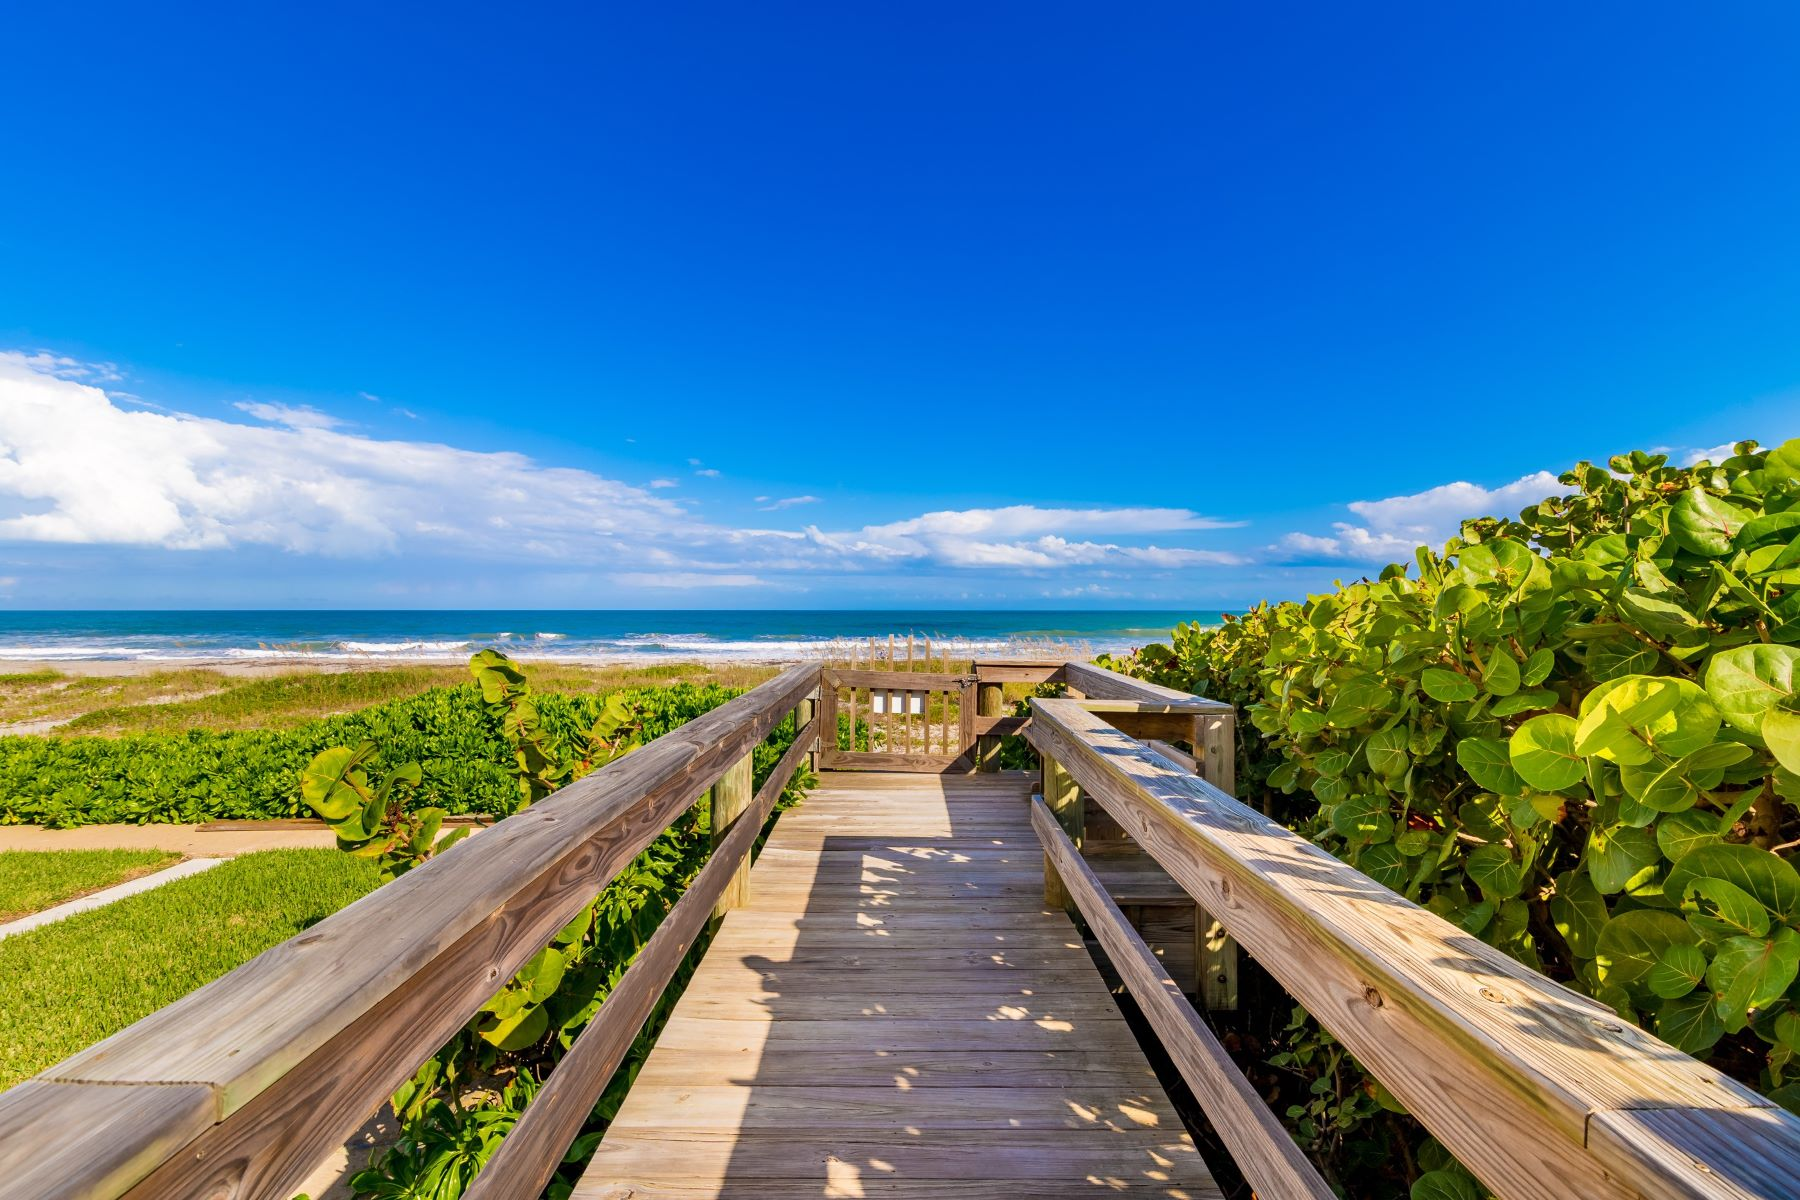 Condominiums для того Продажа на Impressive Oceanfront Condo 3031 S Atlantic Avenue 103 Cocoa Beach, Флорида 32931 Соединенные Штаты